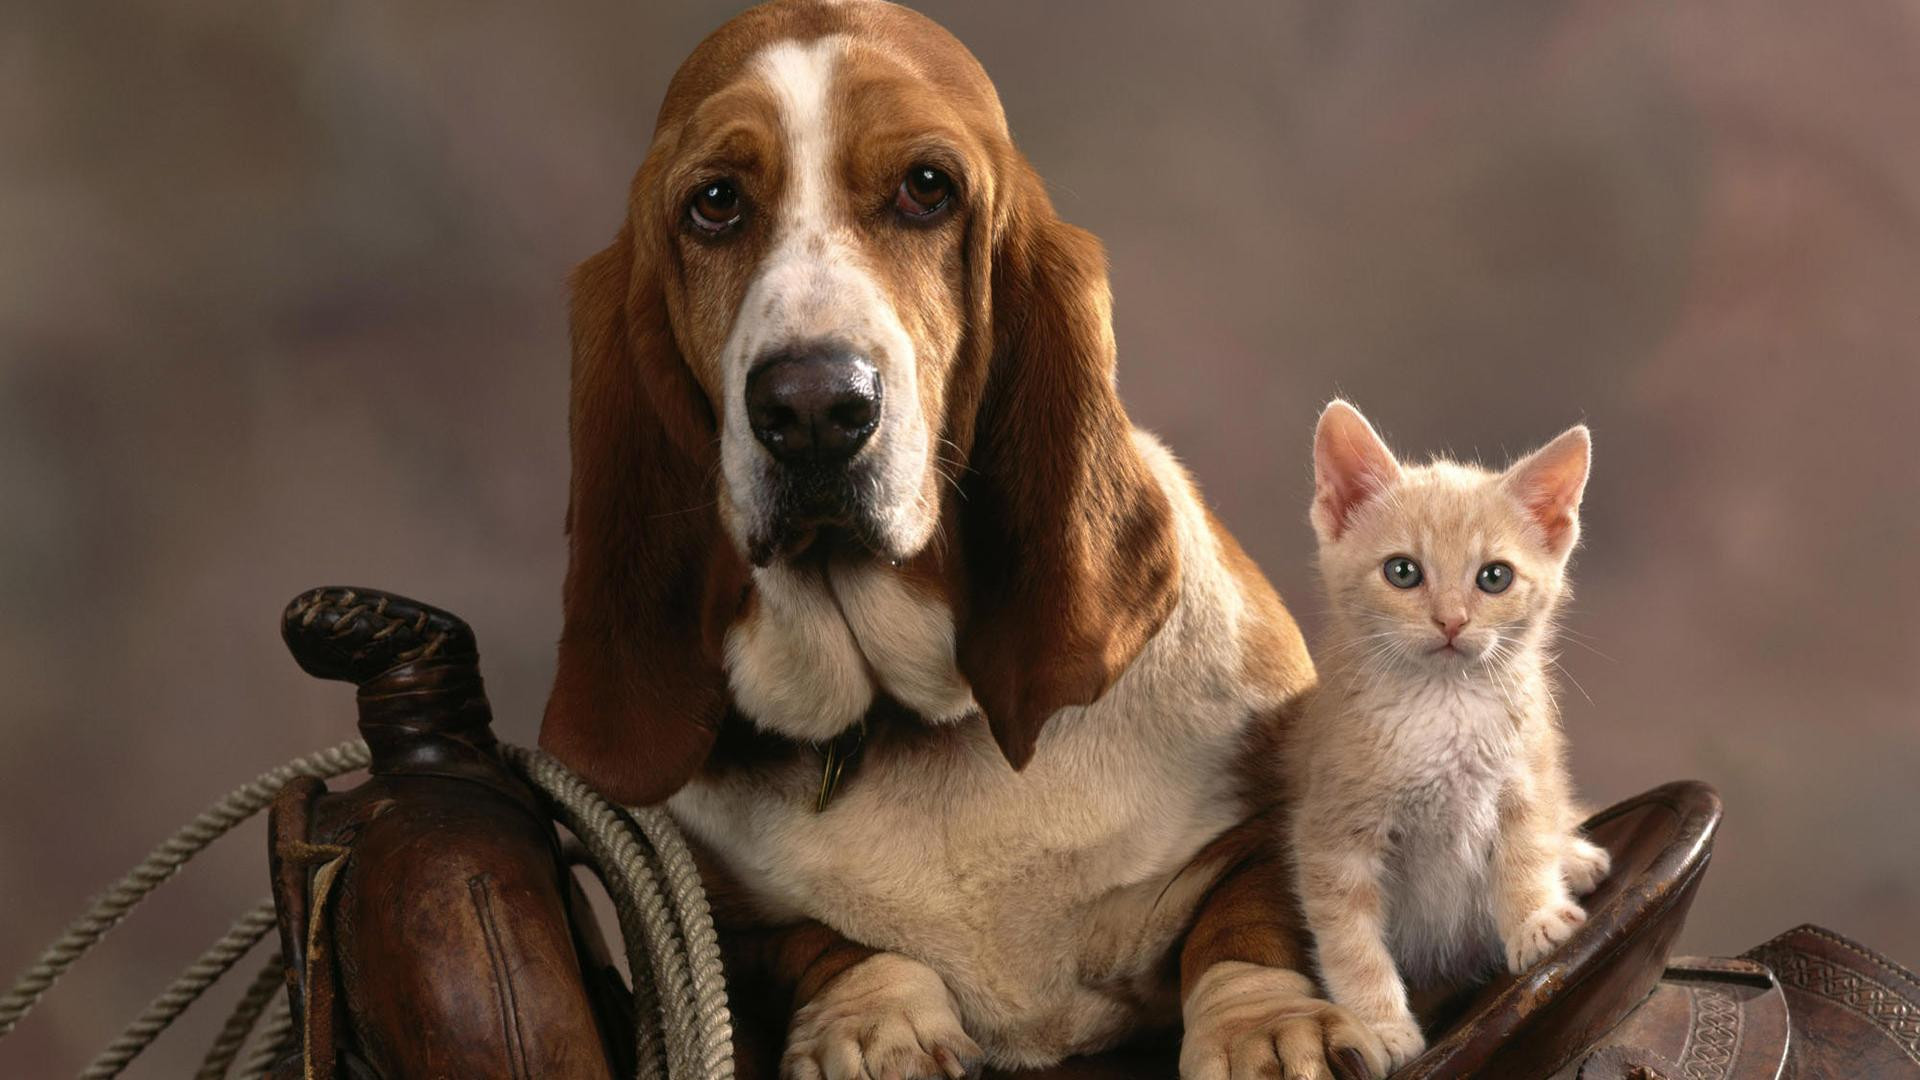 1920x1080 Wallpaper Dog Cat Couple Friends Care